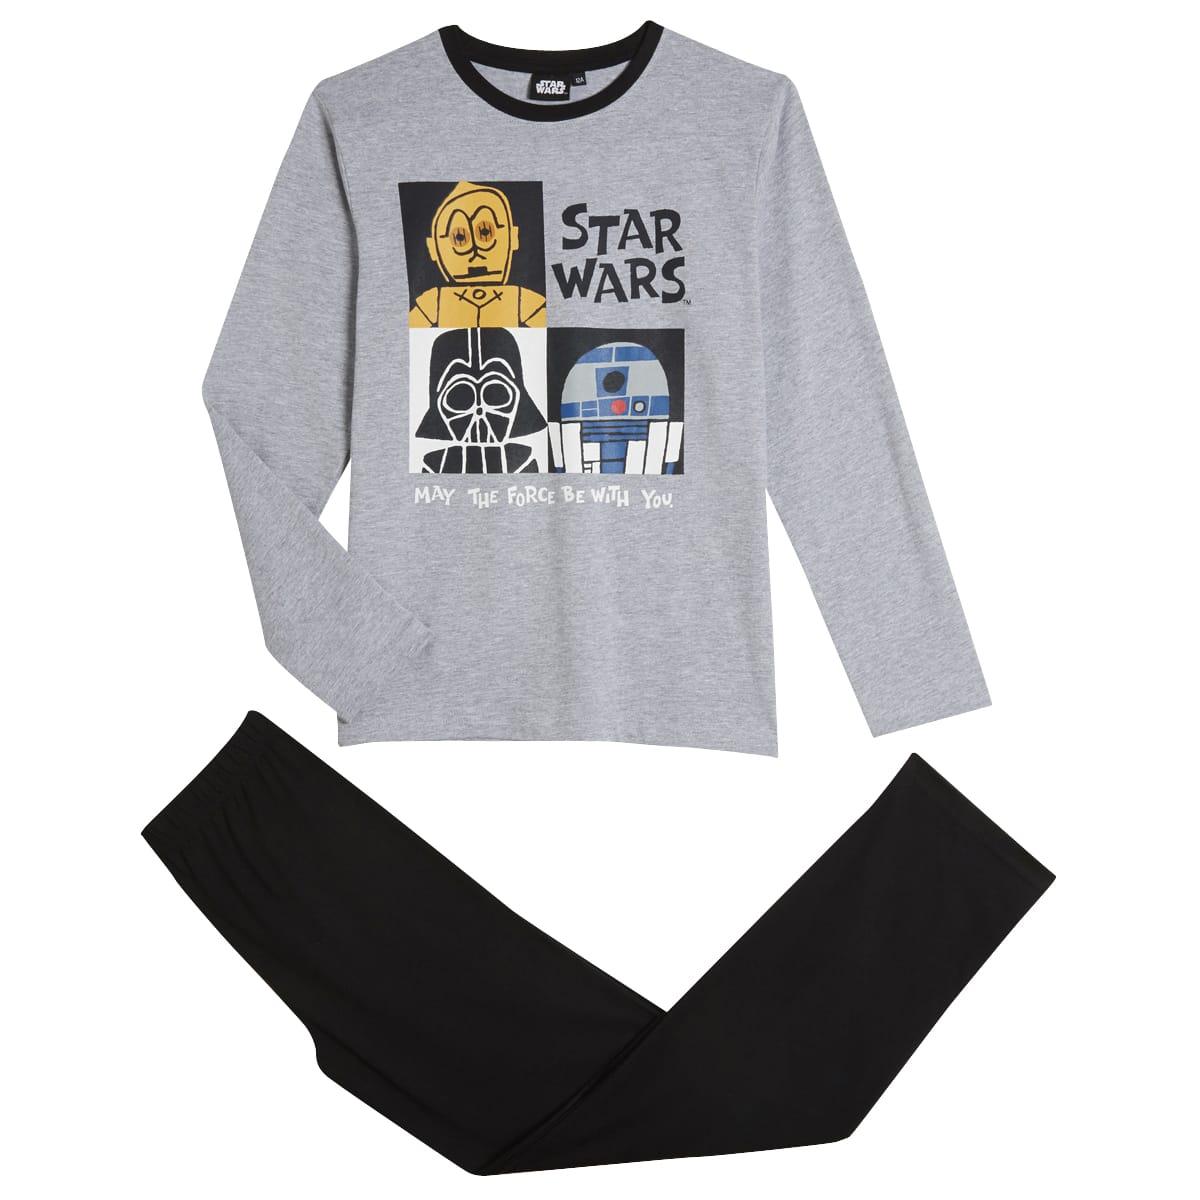 Pyjama STAR WARS Garçon du 2 au 16 ans STAR WARS pas cher à prix